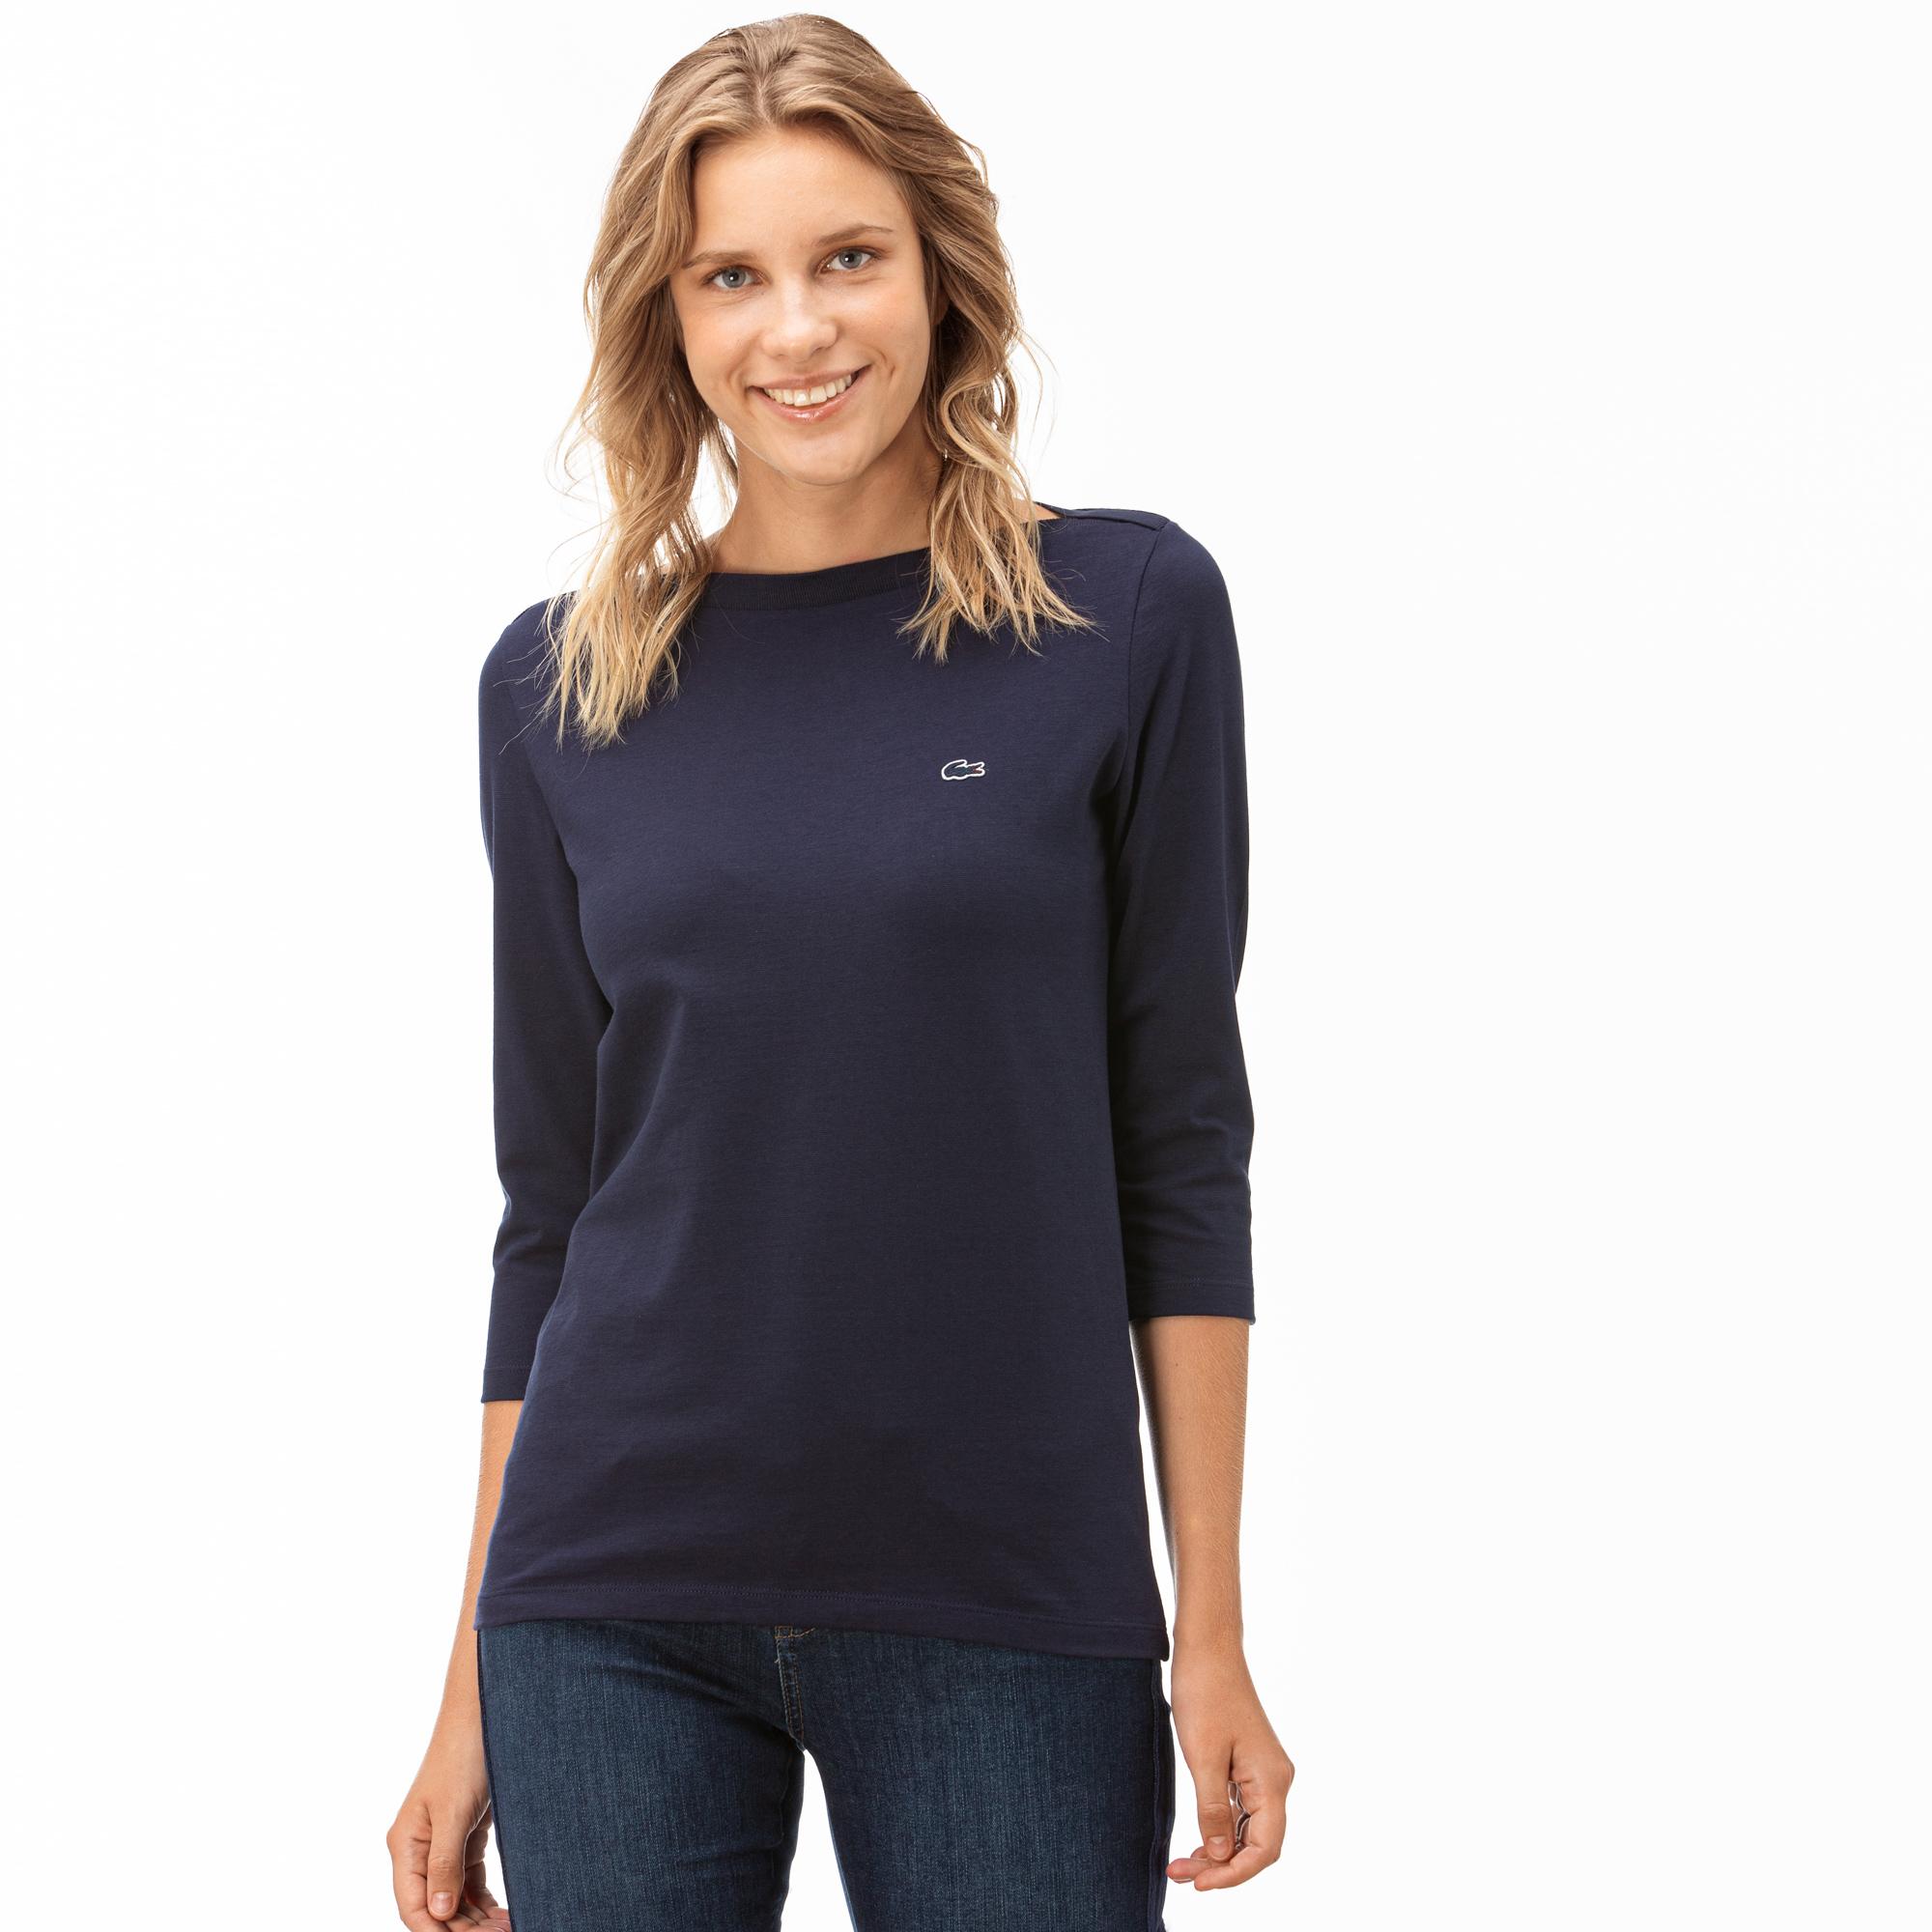 Lacoste Damski T-Shirt